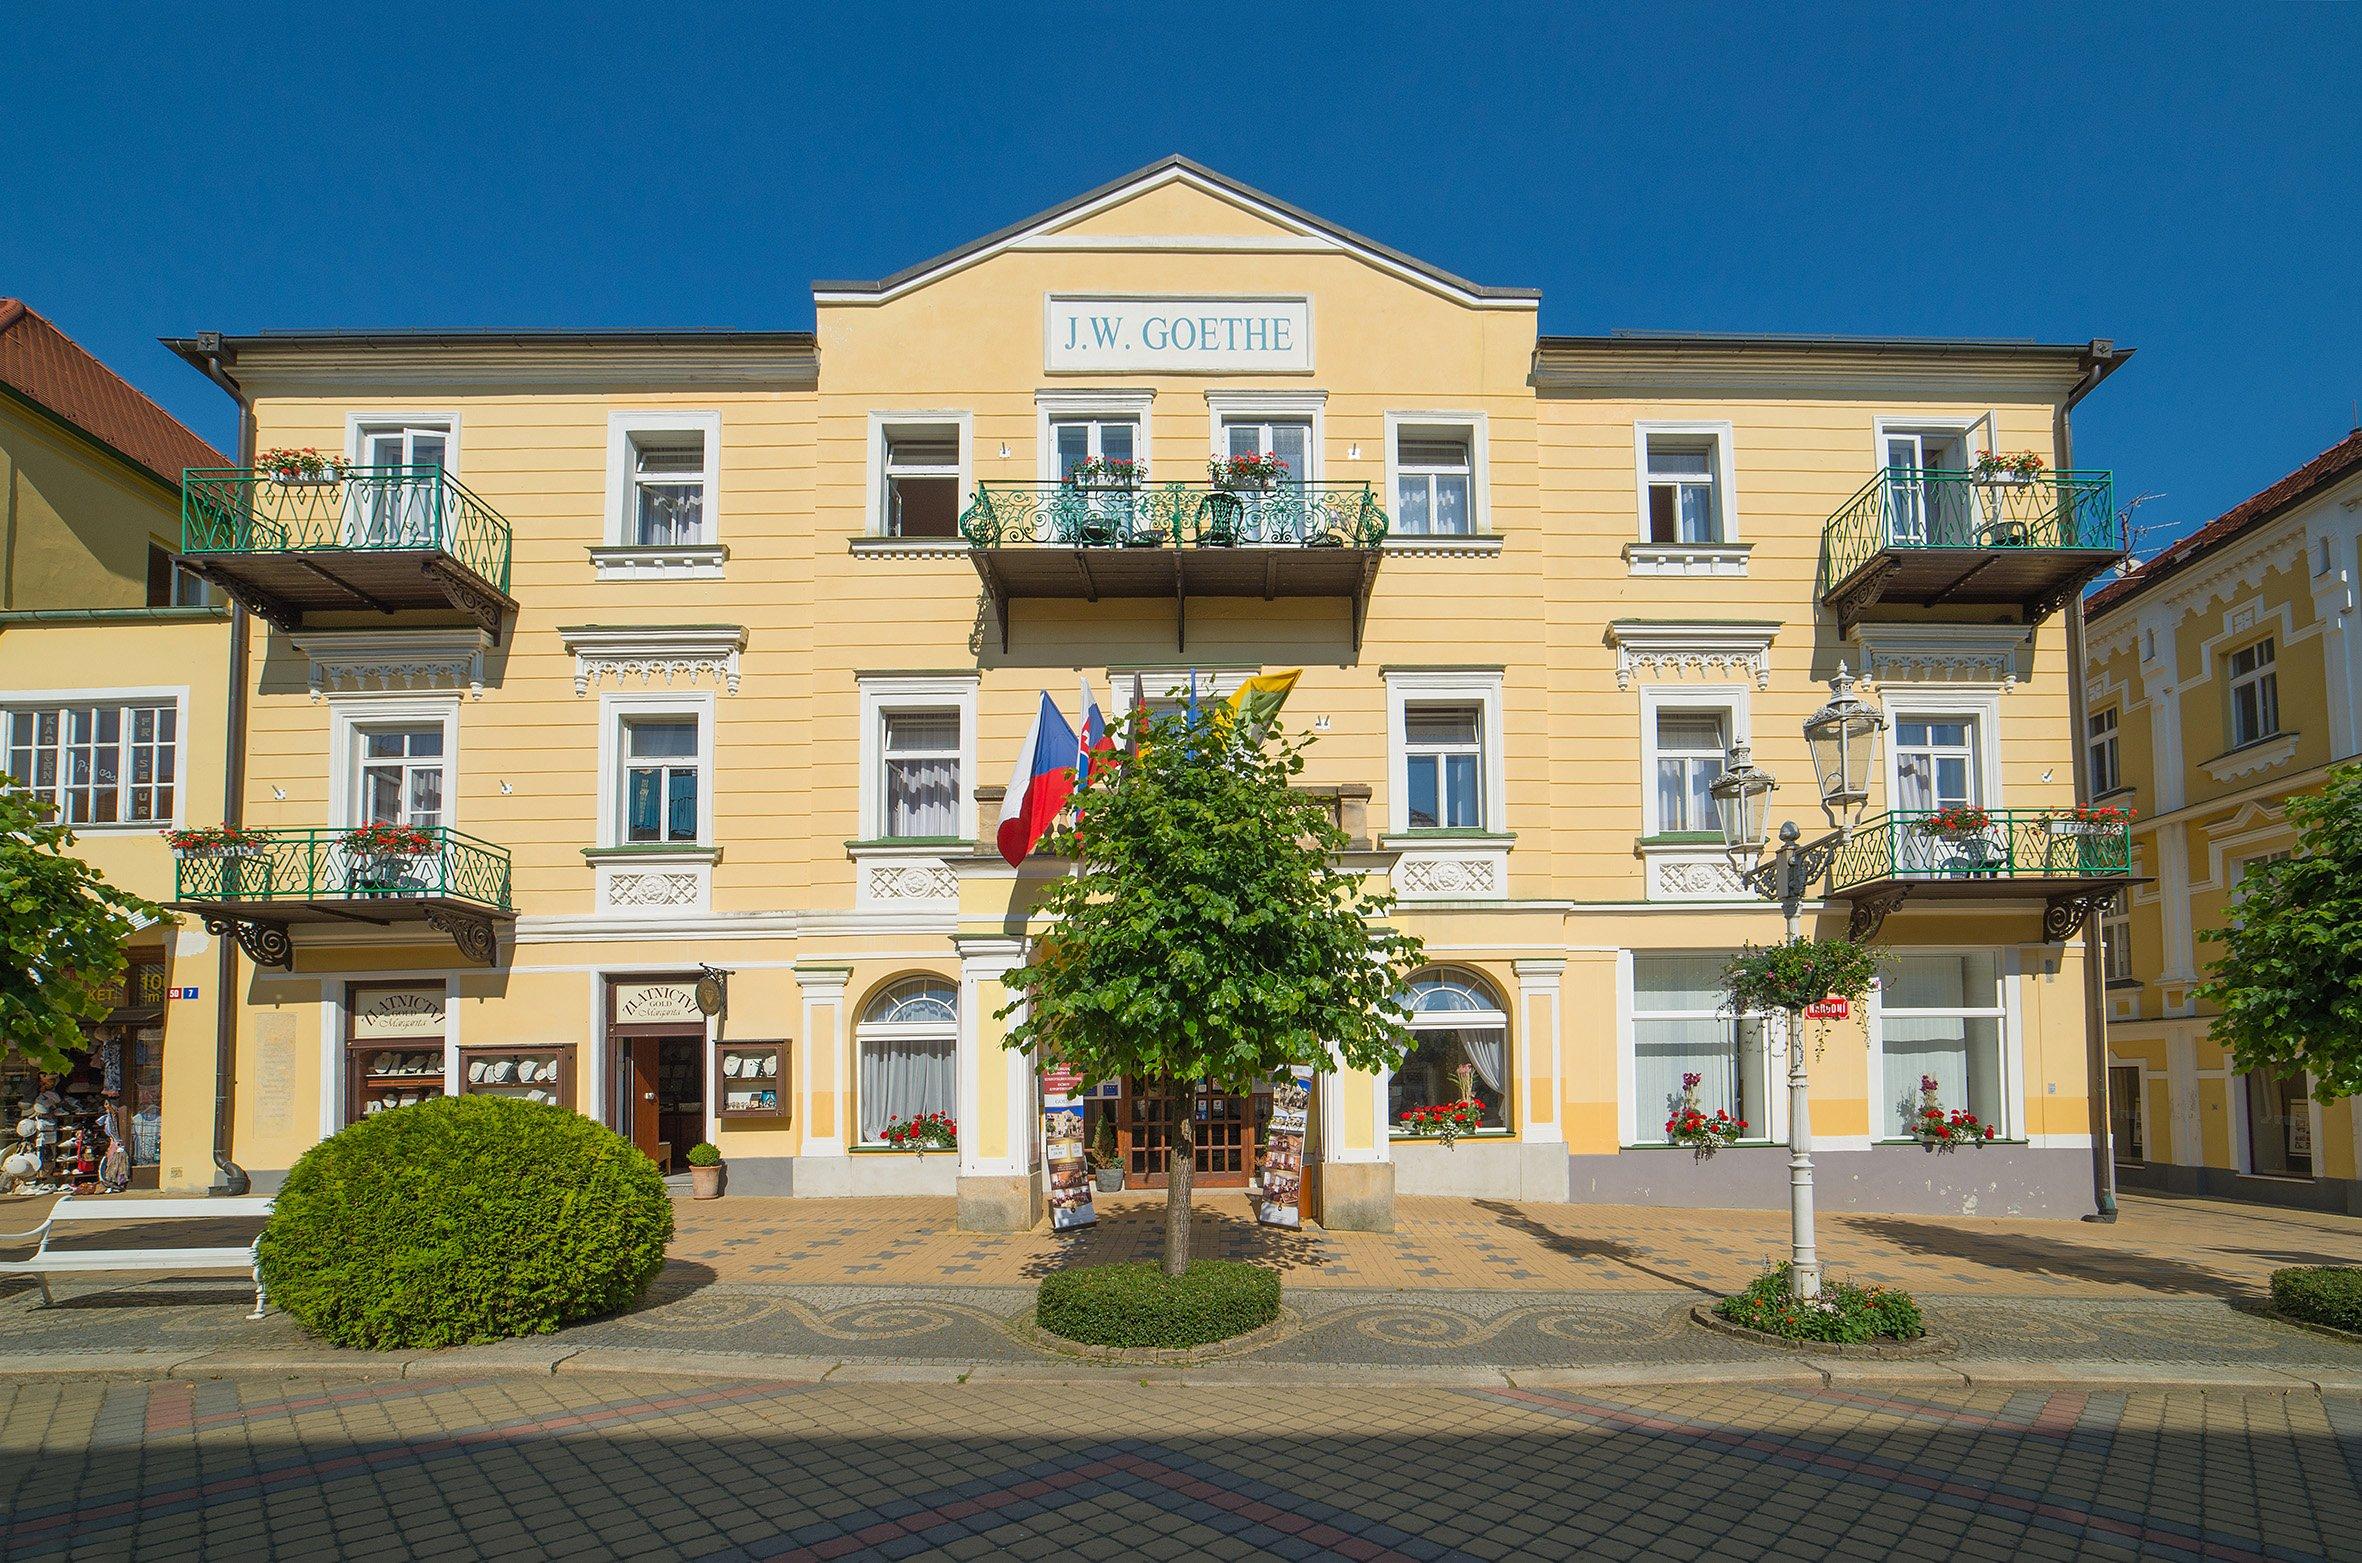 Goethe Spa & Kur Hotel